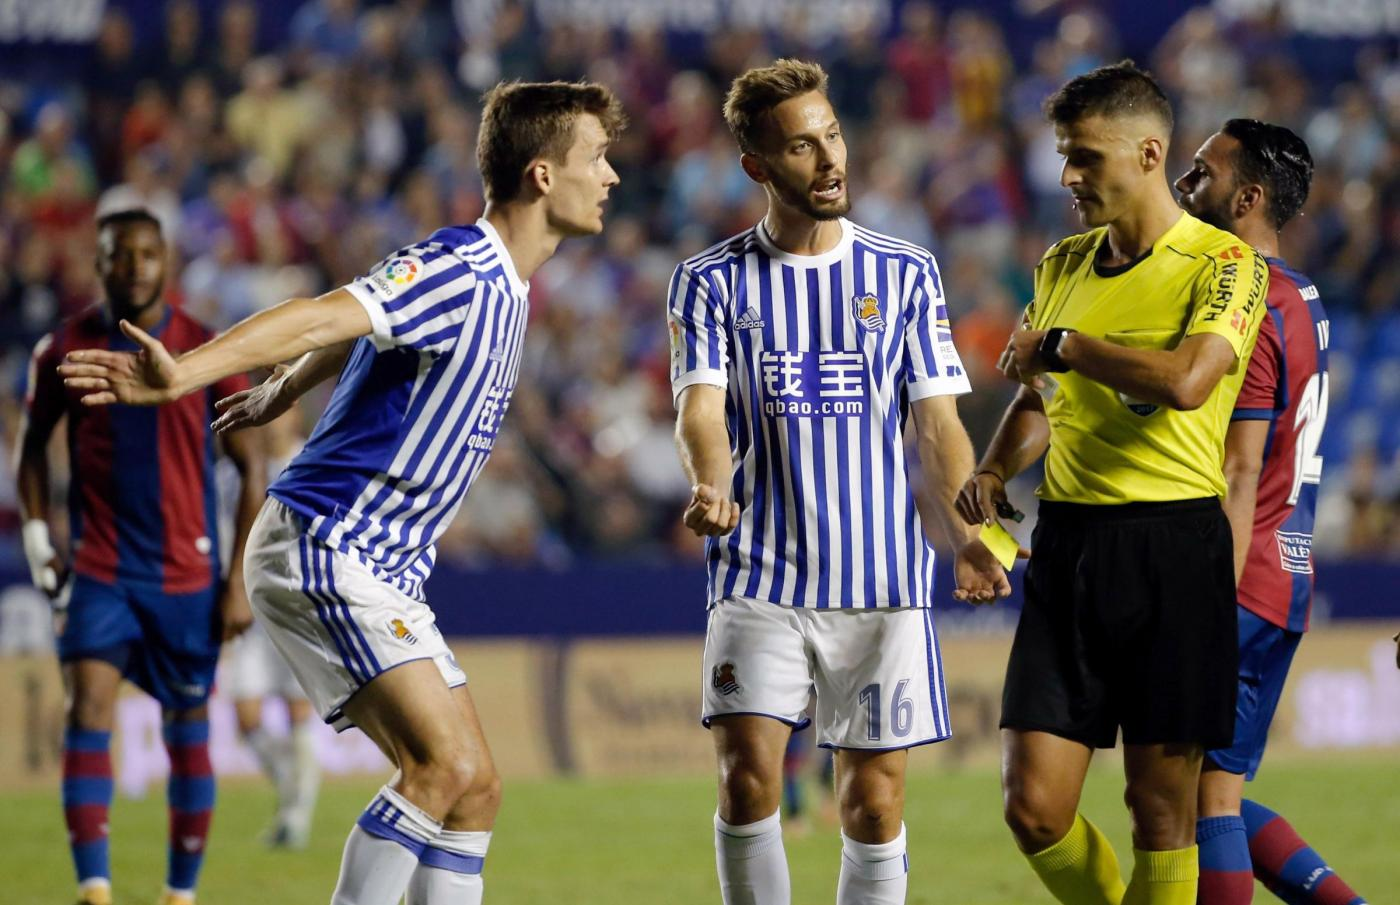 Real Sociedad-Salisburgo 15 febbraio, analisi e pronostico Europa League sedicesimi anadata